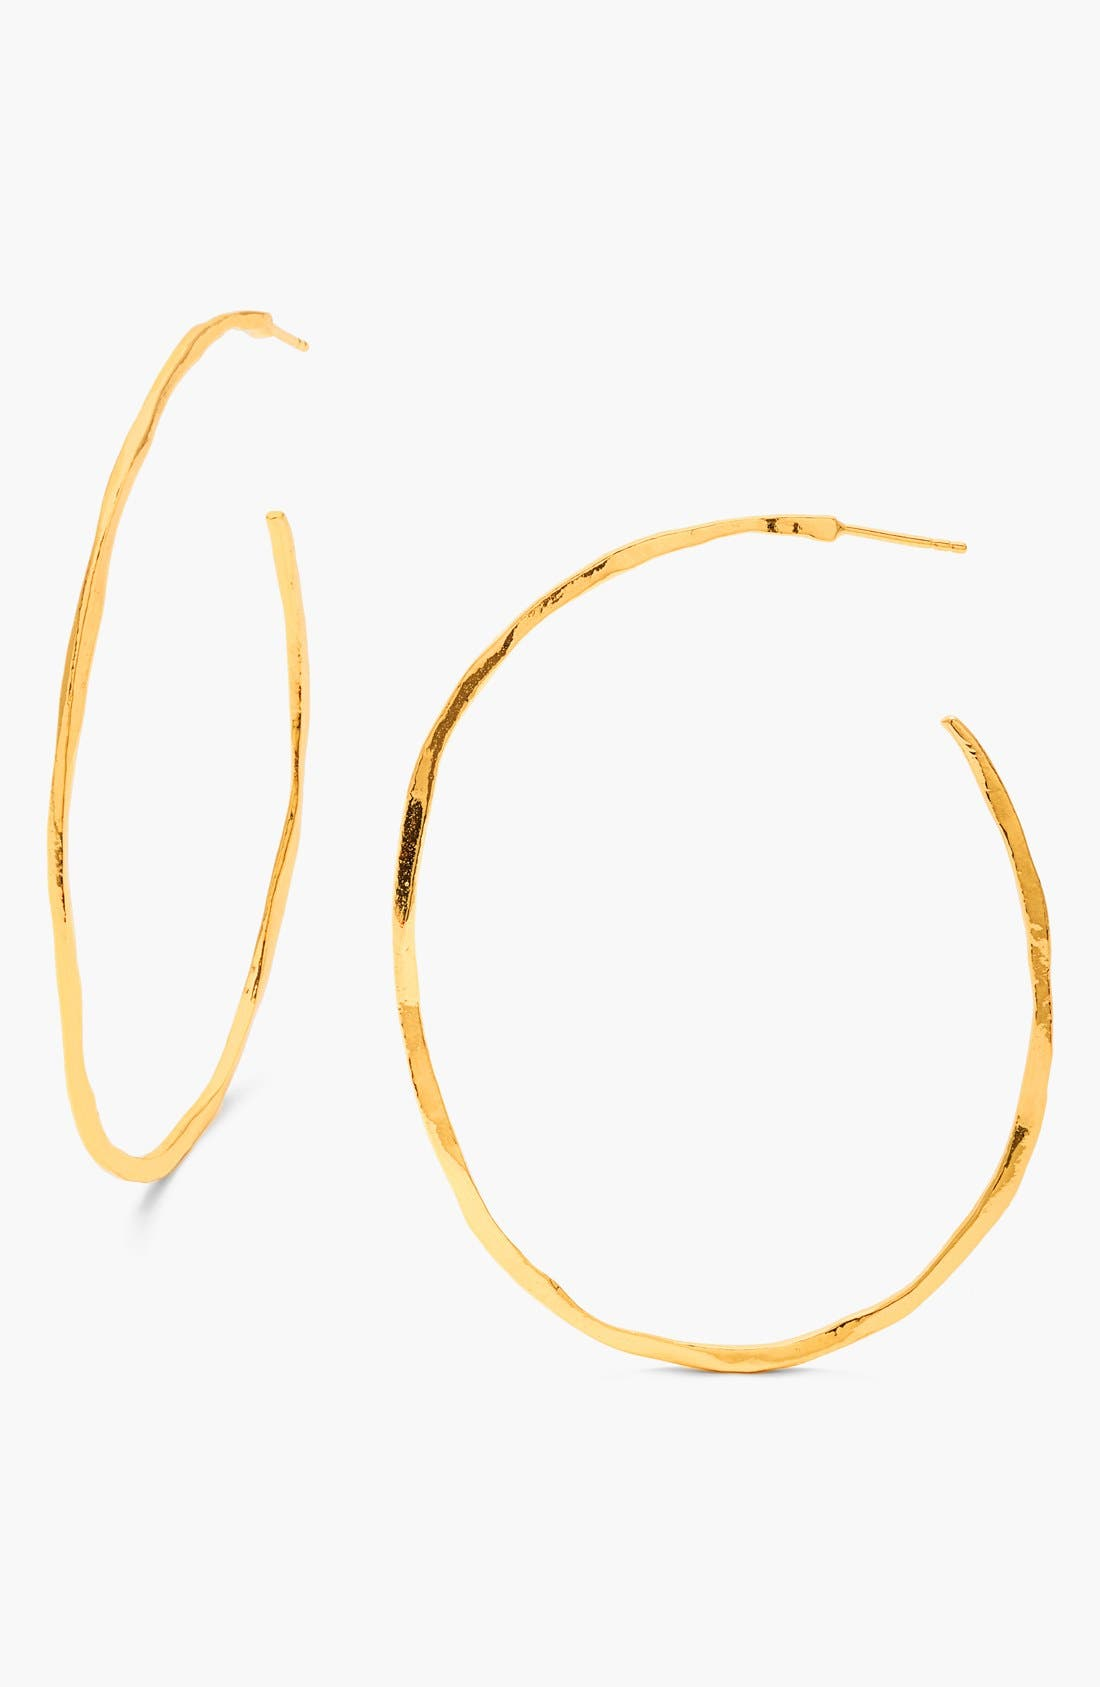 GORJANA, 'Laurel' Hoop Earrings, Alternate thumbnail 6, color, 710